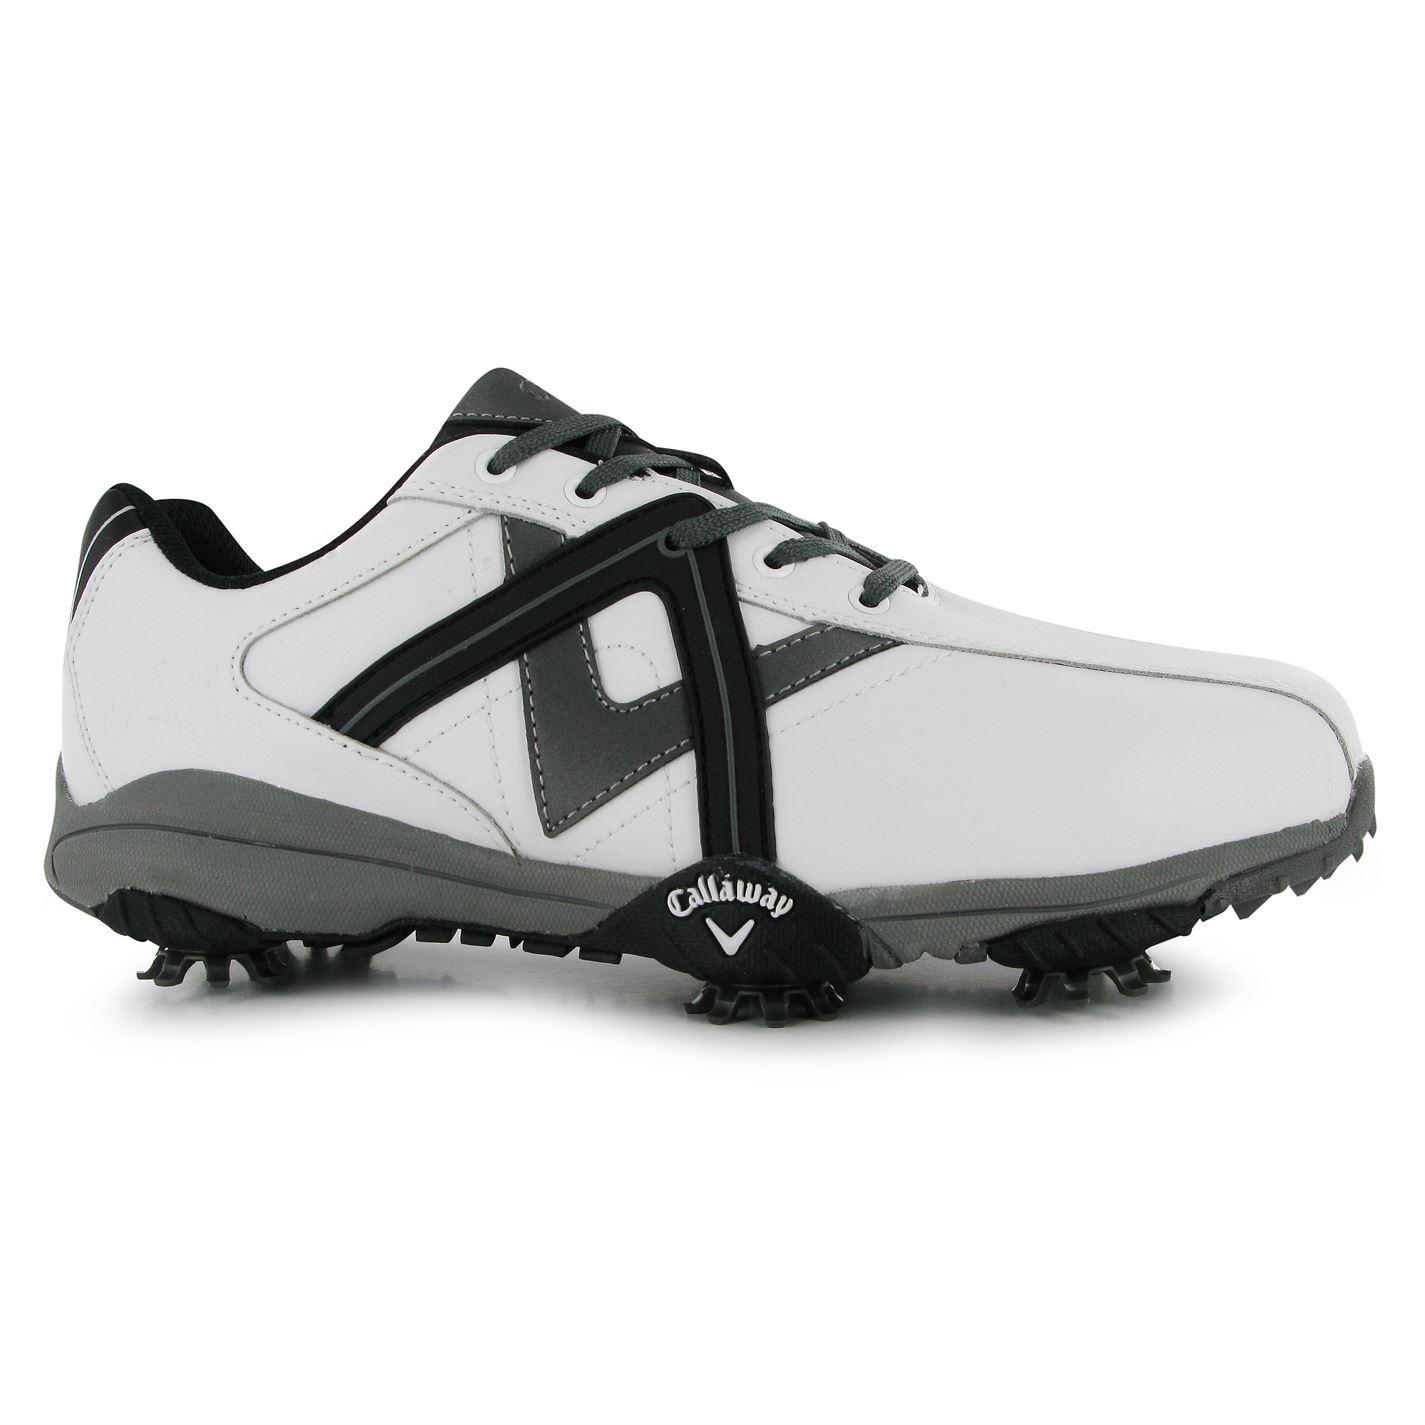 Callaway-Cheviot-ll-Golf-Shoes-Mens-Spikes-Footwear thumbnail 16